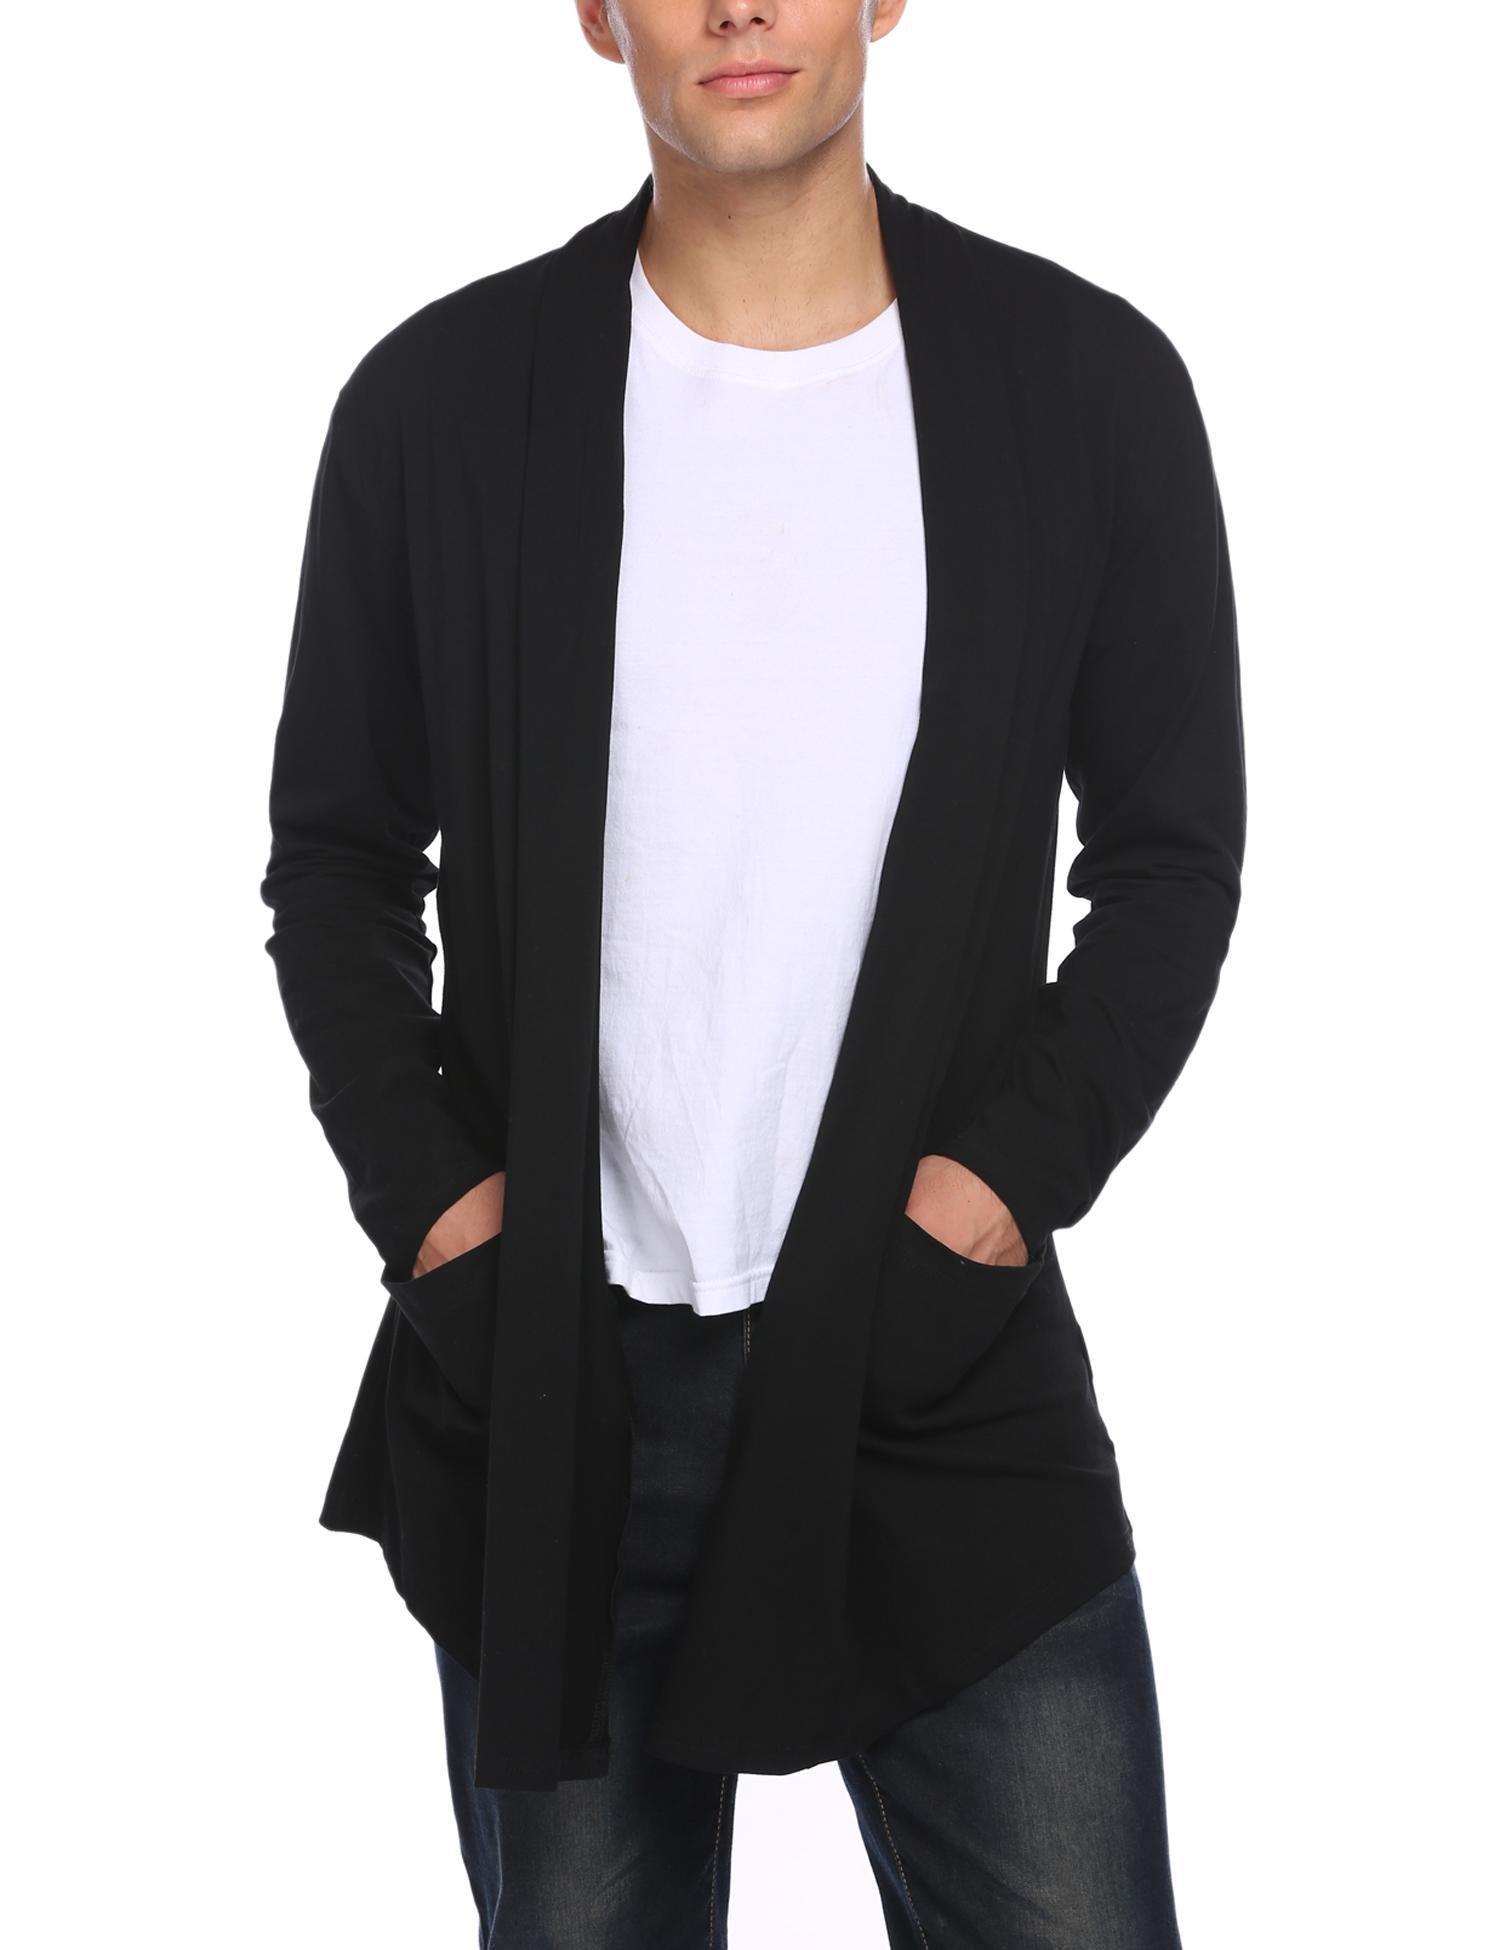 Donet Men's Ruffle Shawl Collar Cardigan Lightweight Cotton Blend Long Length Drape Cape Black XX-Large